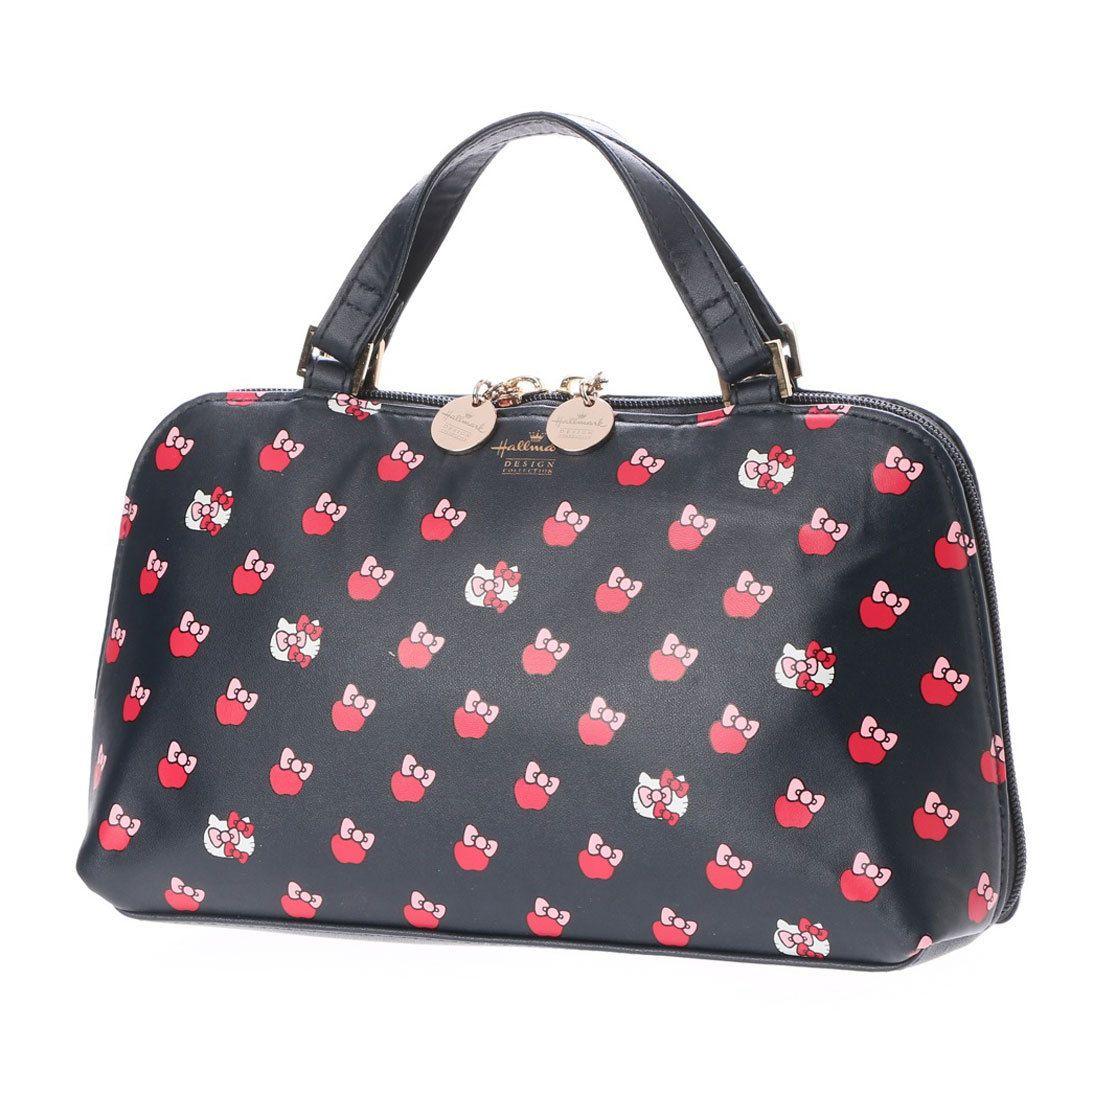 a82f6d3ccc81 Hello Kitty × Hallmark 2Way Mini Shoulder Bag Navy  hellokitty   minishoulderbag  bag  bostonbag